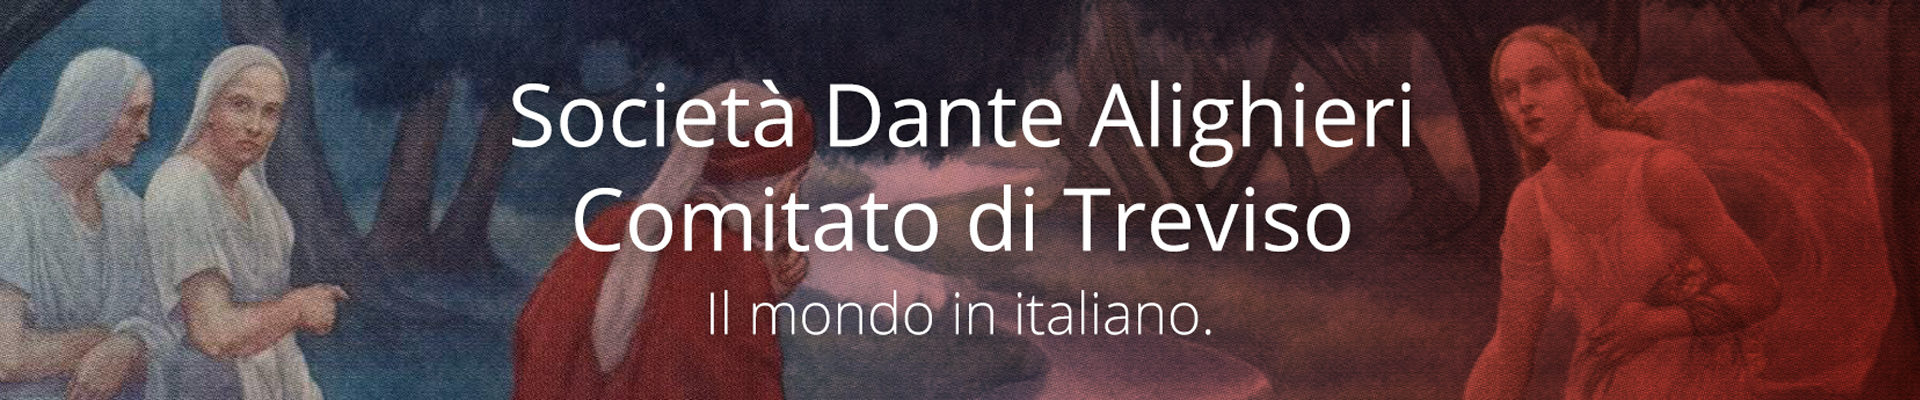 17.01.19 | La Firenze di Cosimo de' Medici